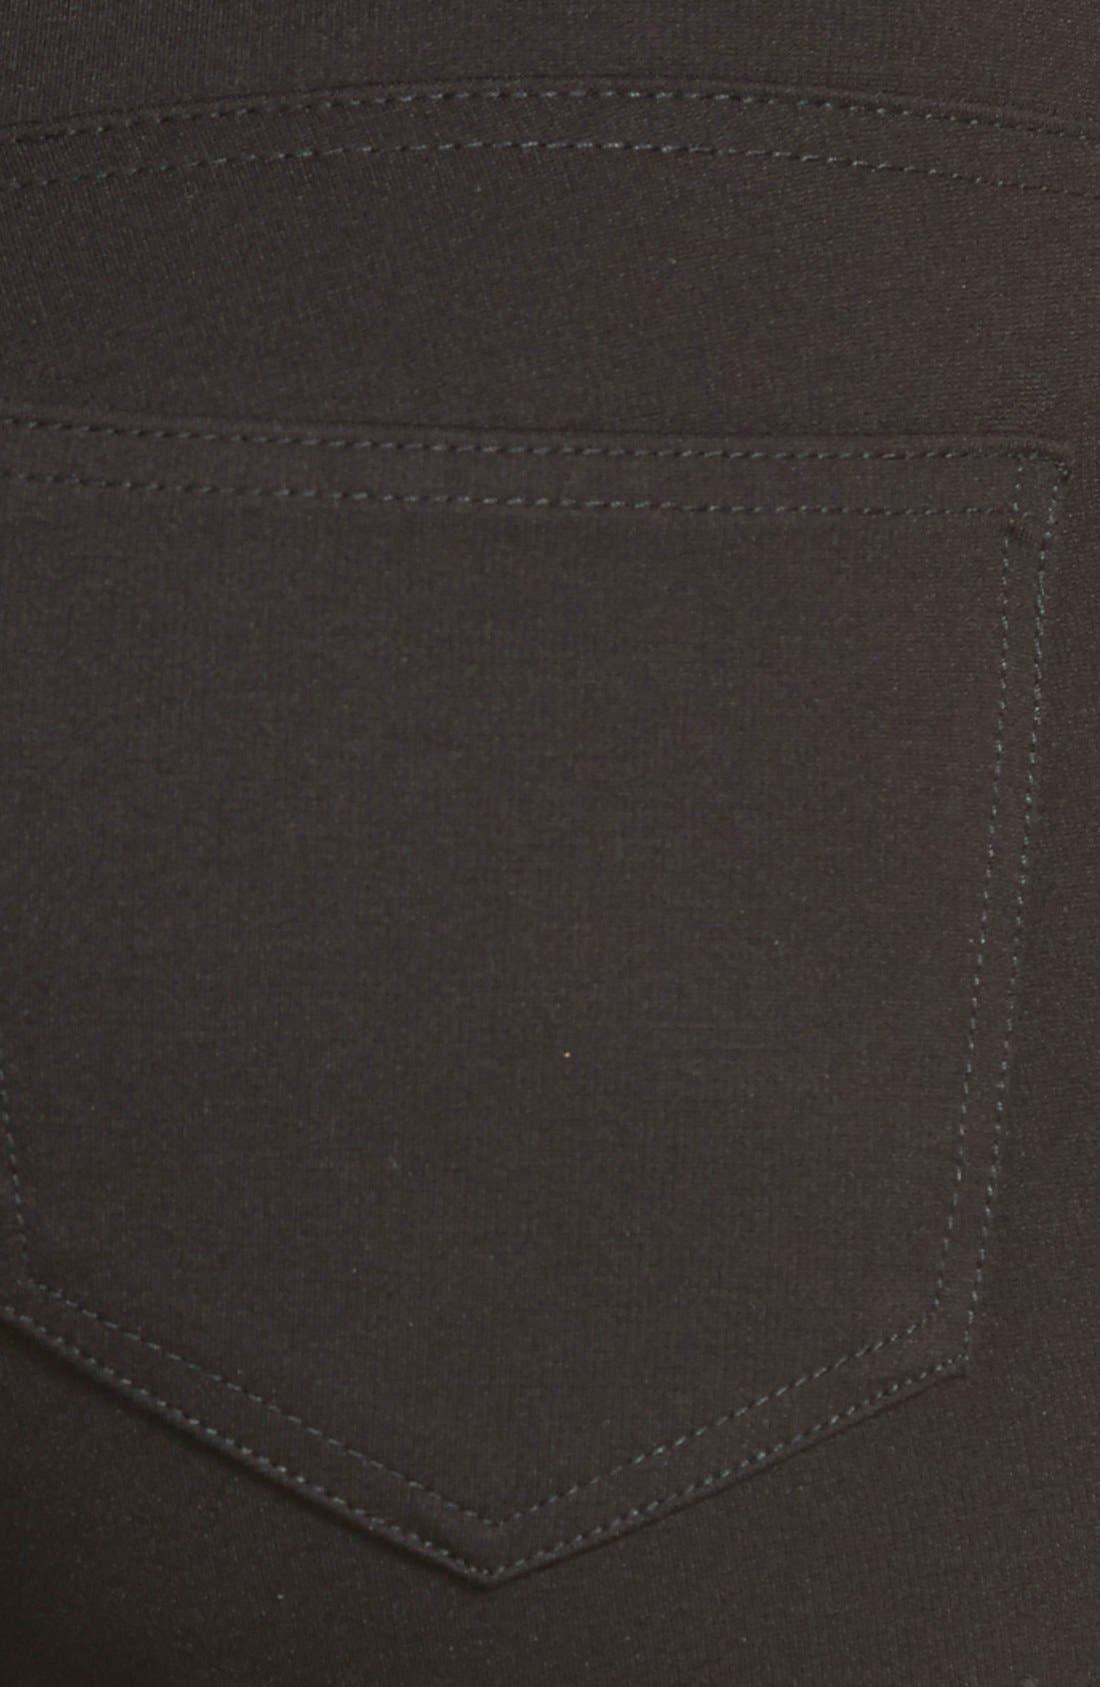 'Mia' Stretch Knit Five-Pocket Skinny Pants,                             Alternate thumbnail 3, color,                             Black